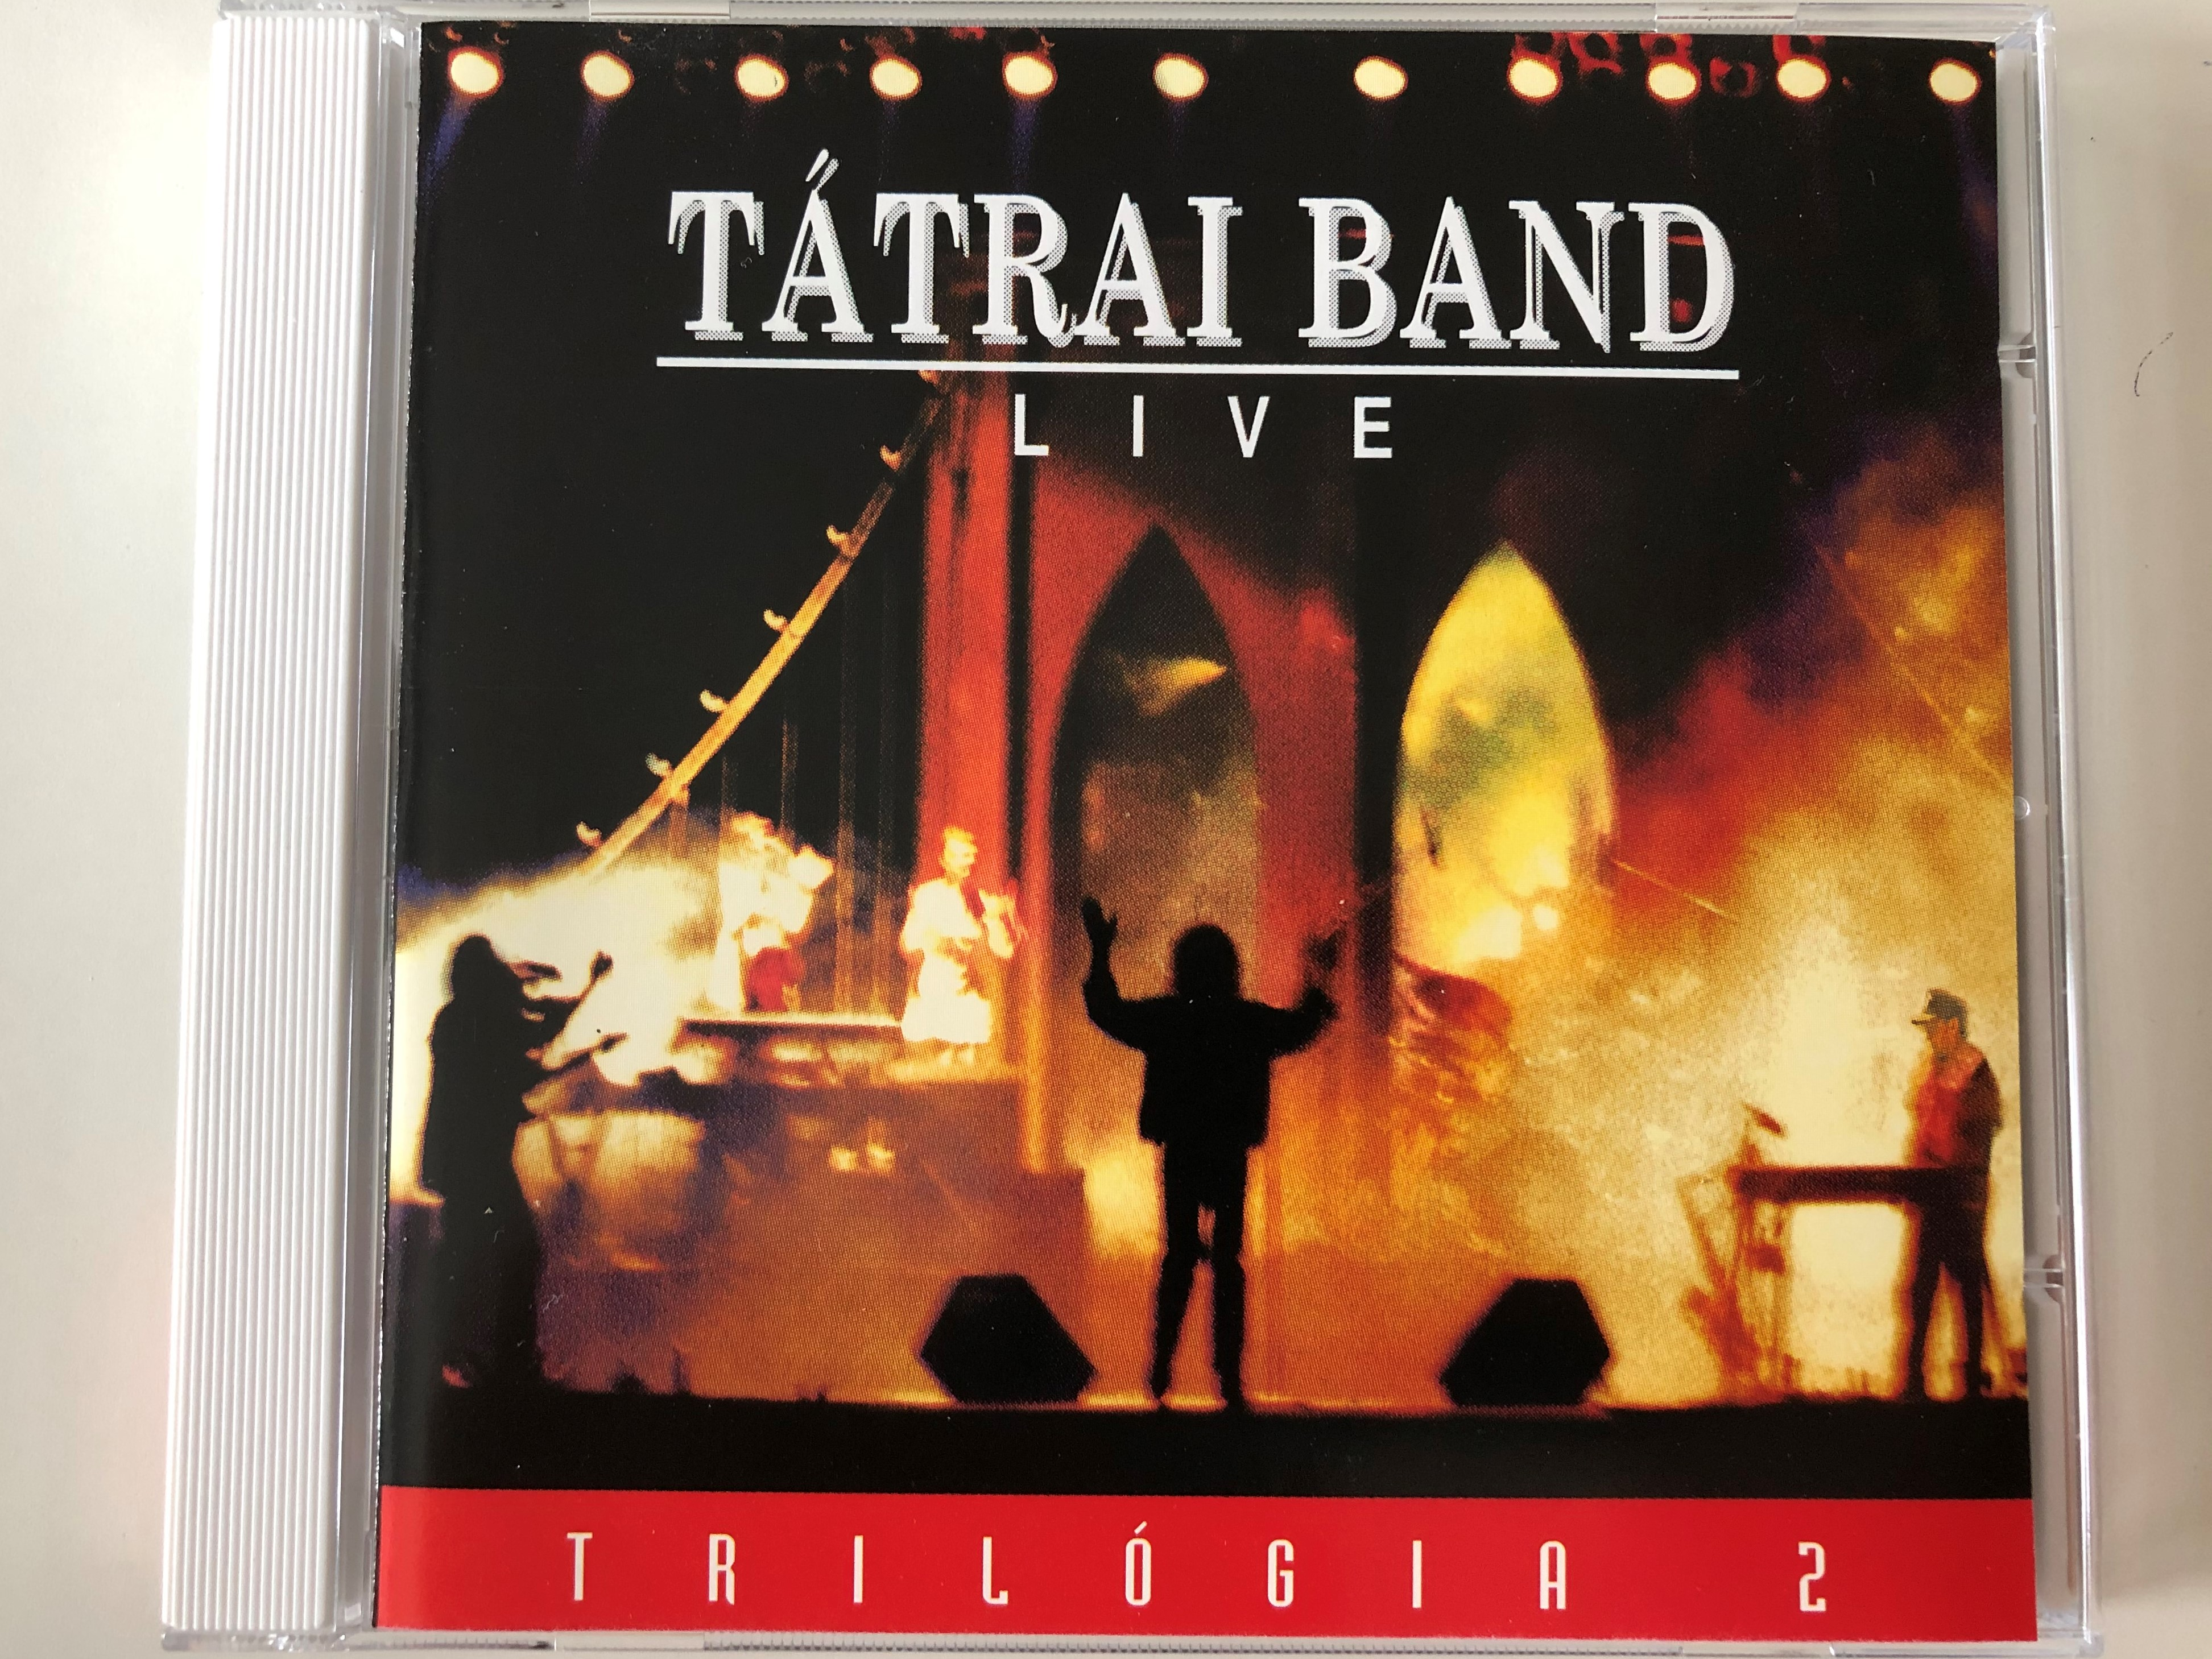 t-trai-band-live-tril-gia-2-magneoton-audio-cd-0630-16848-2-1-.jpg